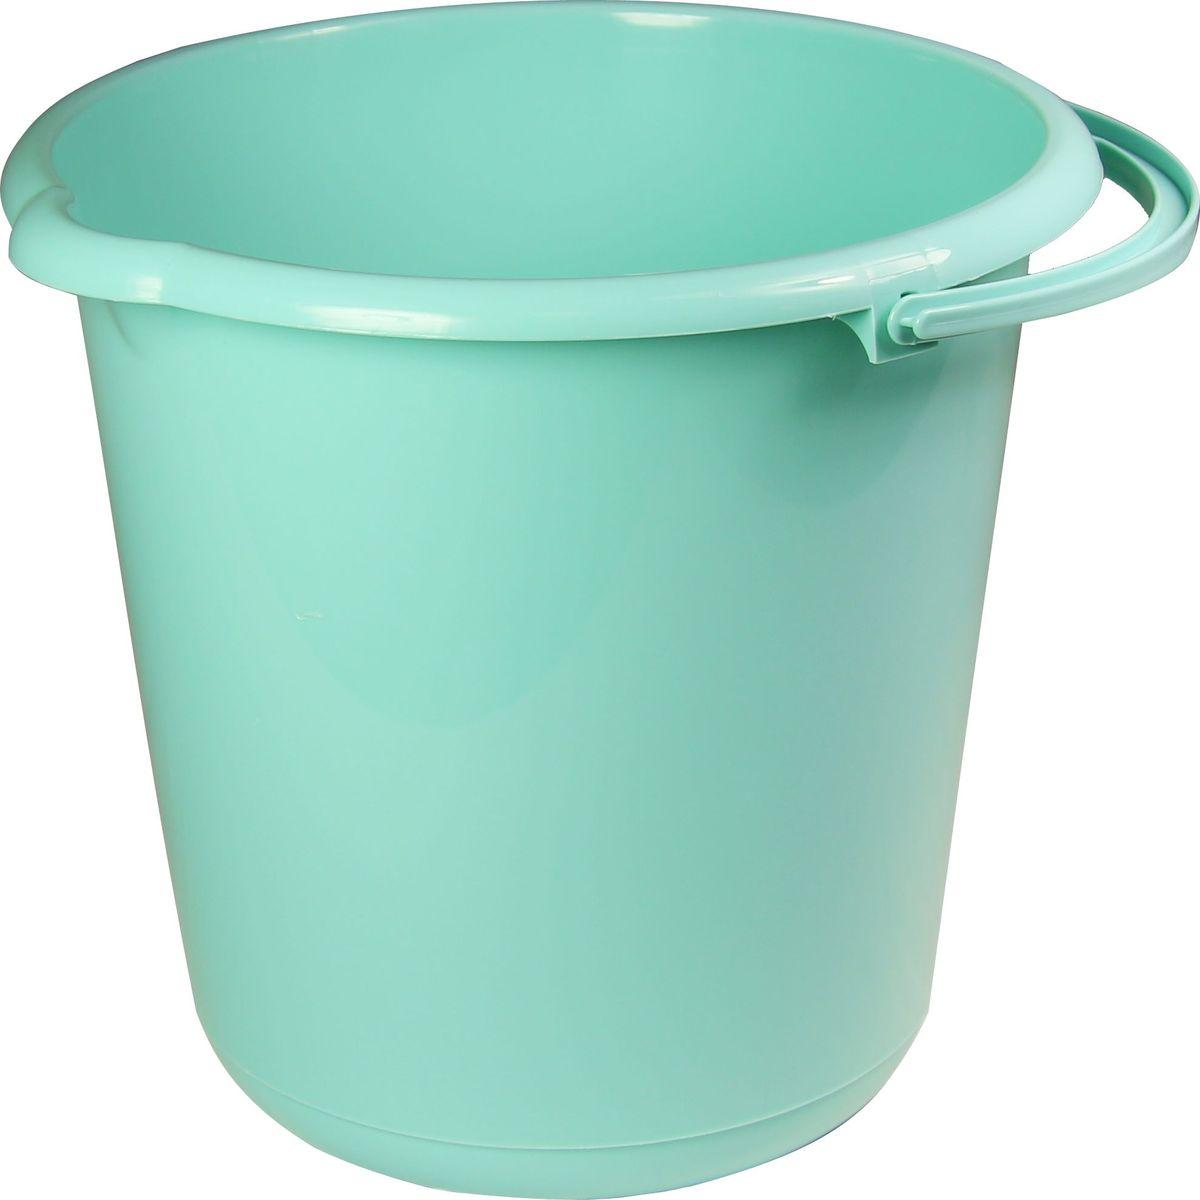 Ведро хозяйственное Idea, цвет: аквамарин, 3 л. М 2428М 2428_аквамарин